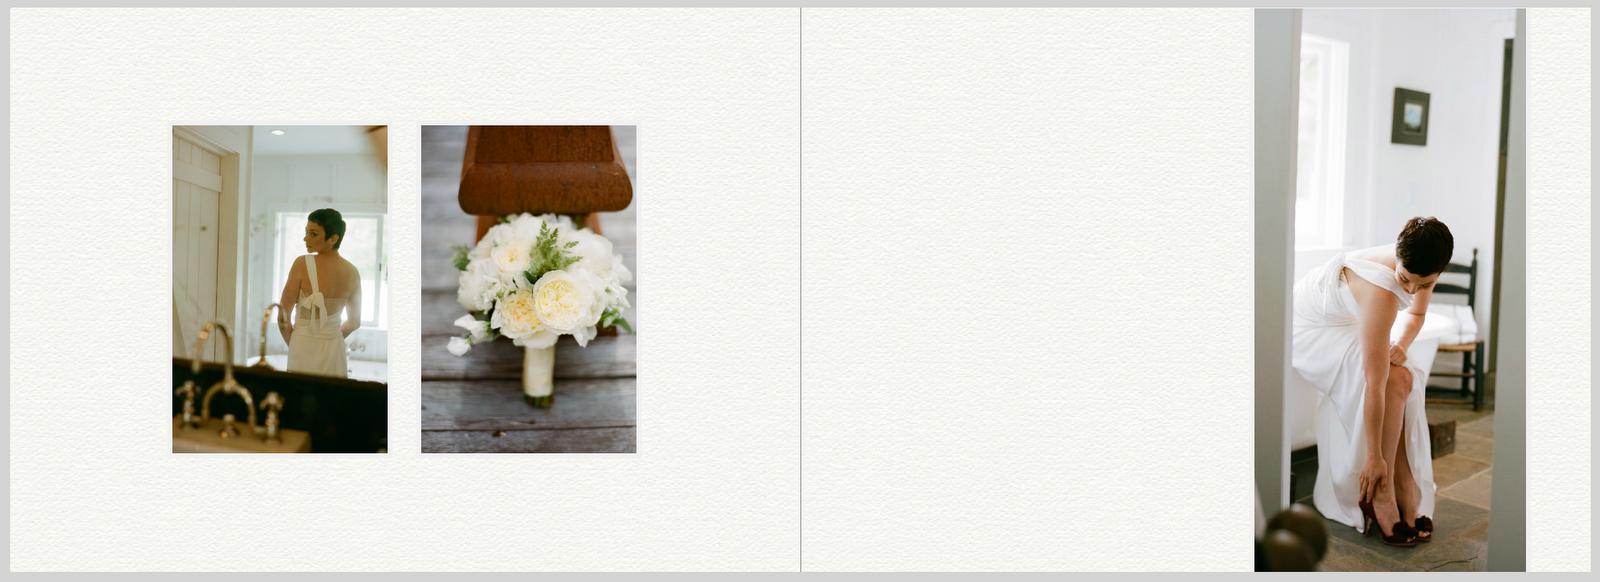 sylvie-gil-film-photography-wedding-album-queensberry